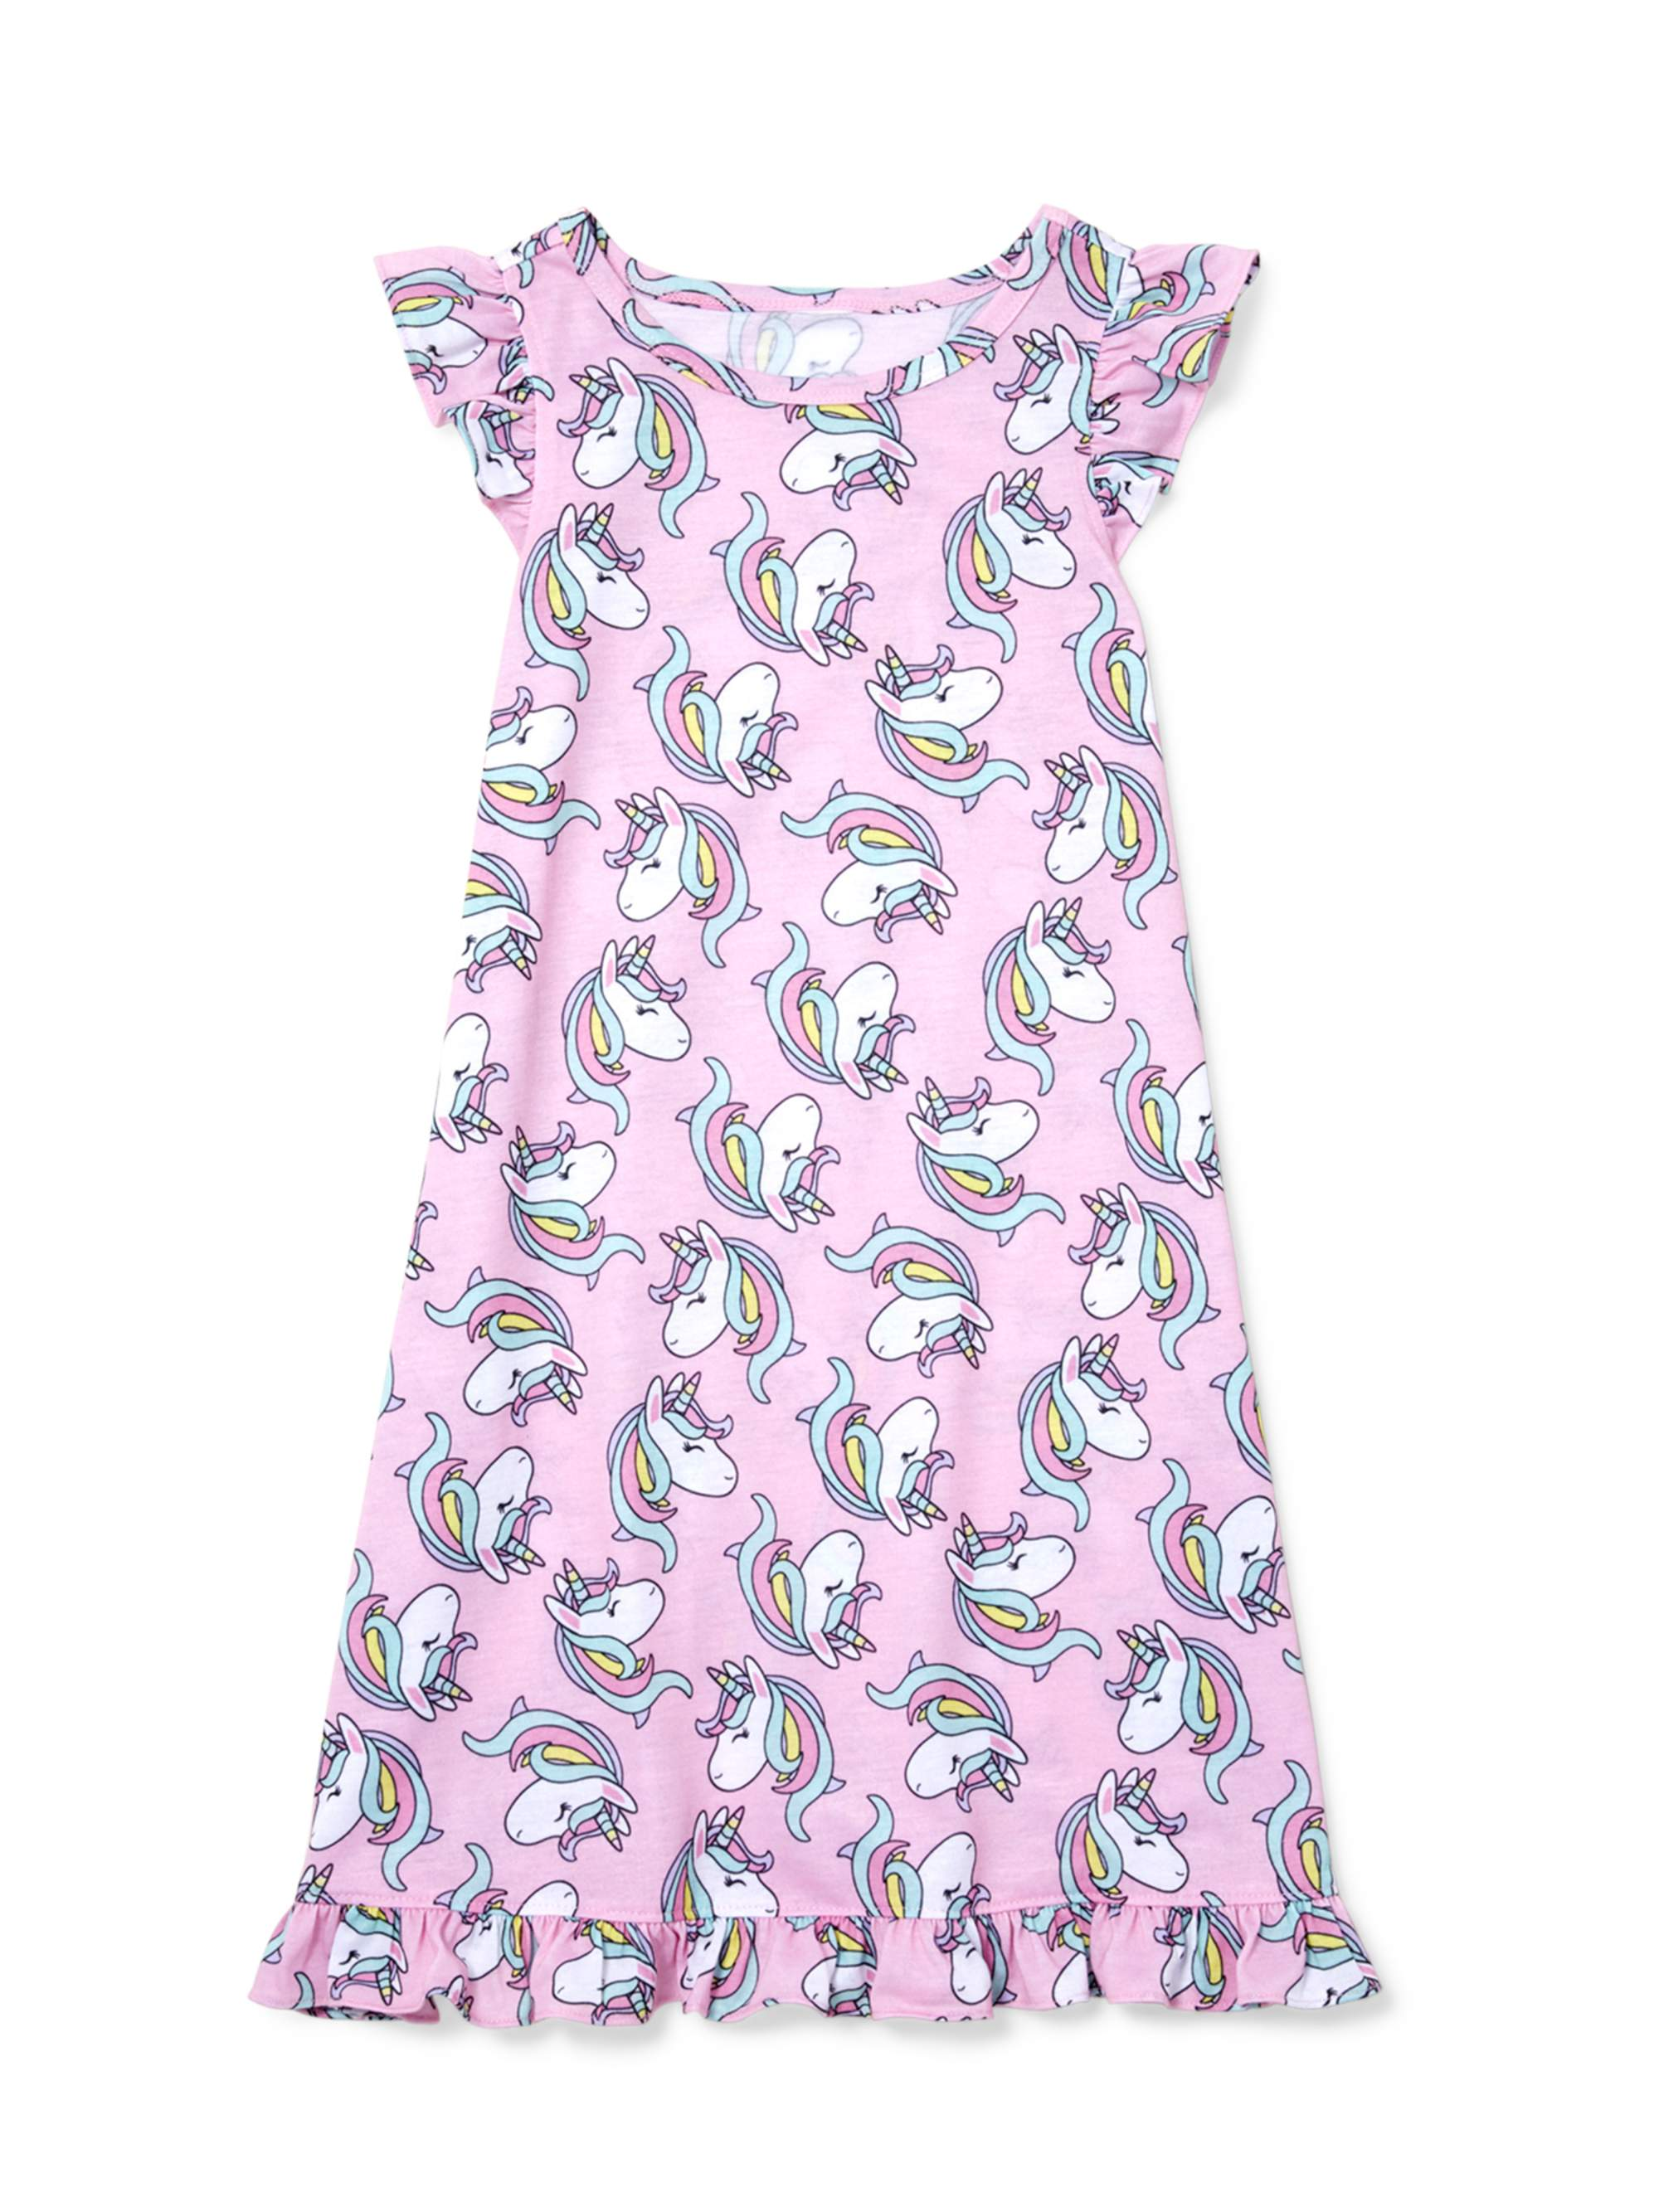 Girls' Ruffle Unicorn Pajama Nightgown (Little Girl & Big Girl)